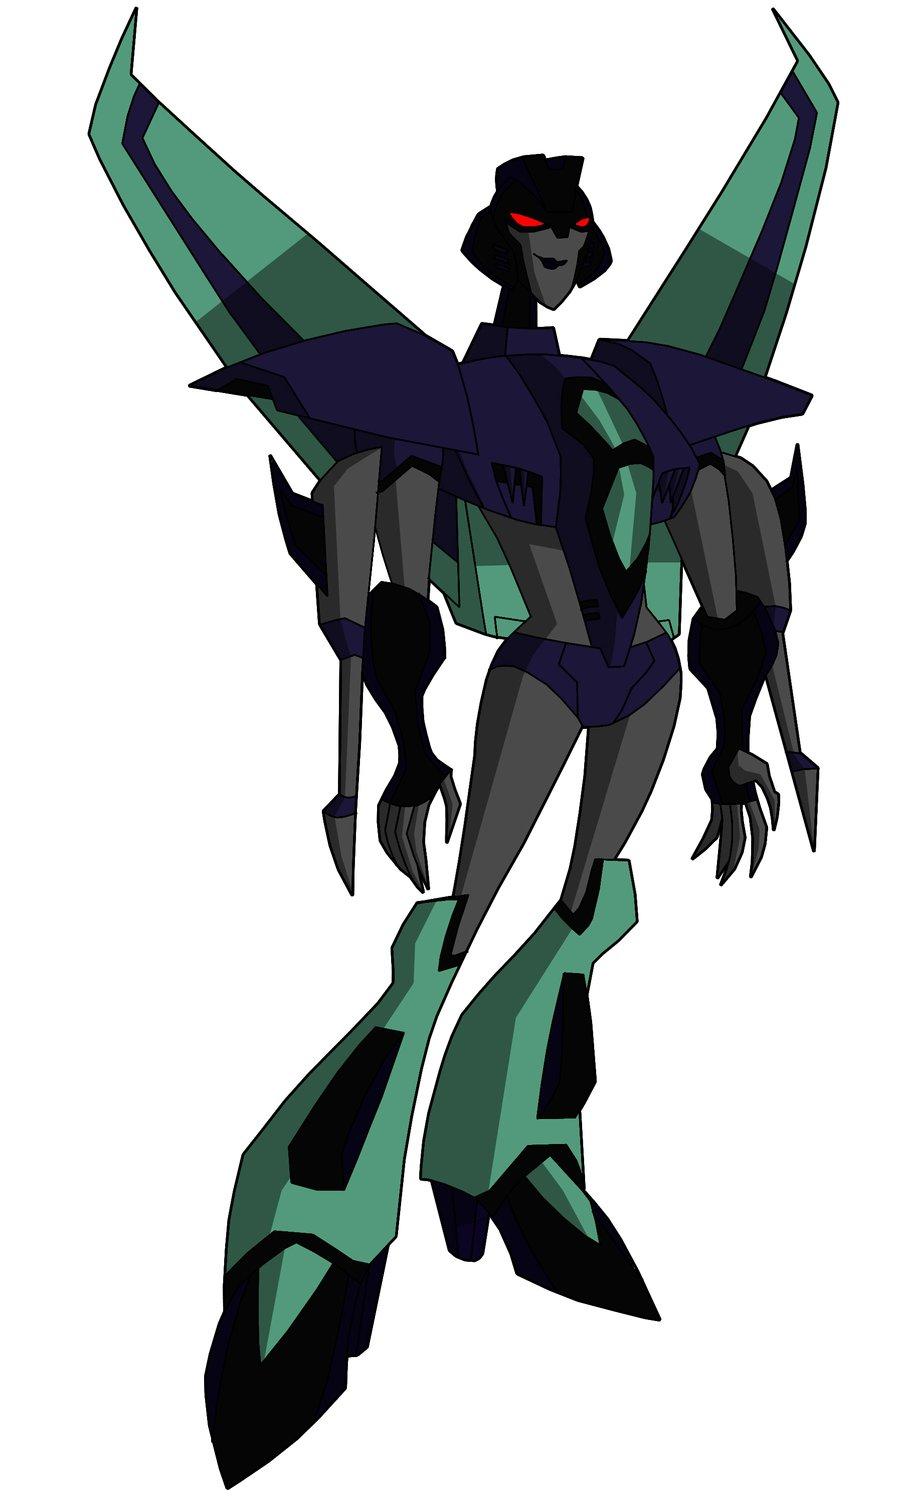 Slipstream Tfa Teletraan Transformers Wiki